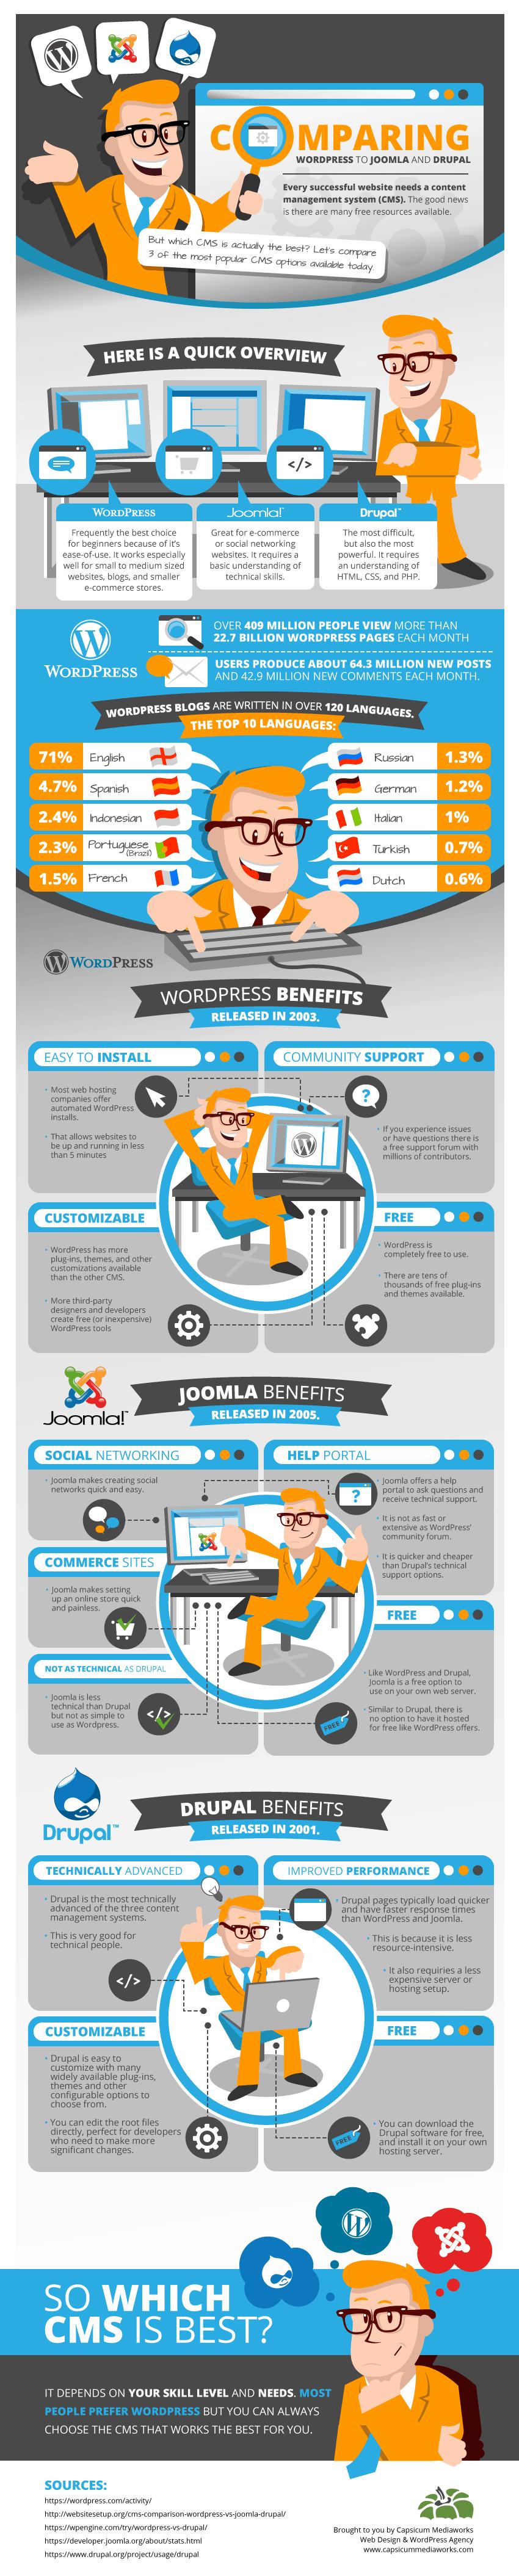 WordPress vs Drupal vs Joomla - Comparison Infographic